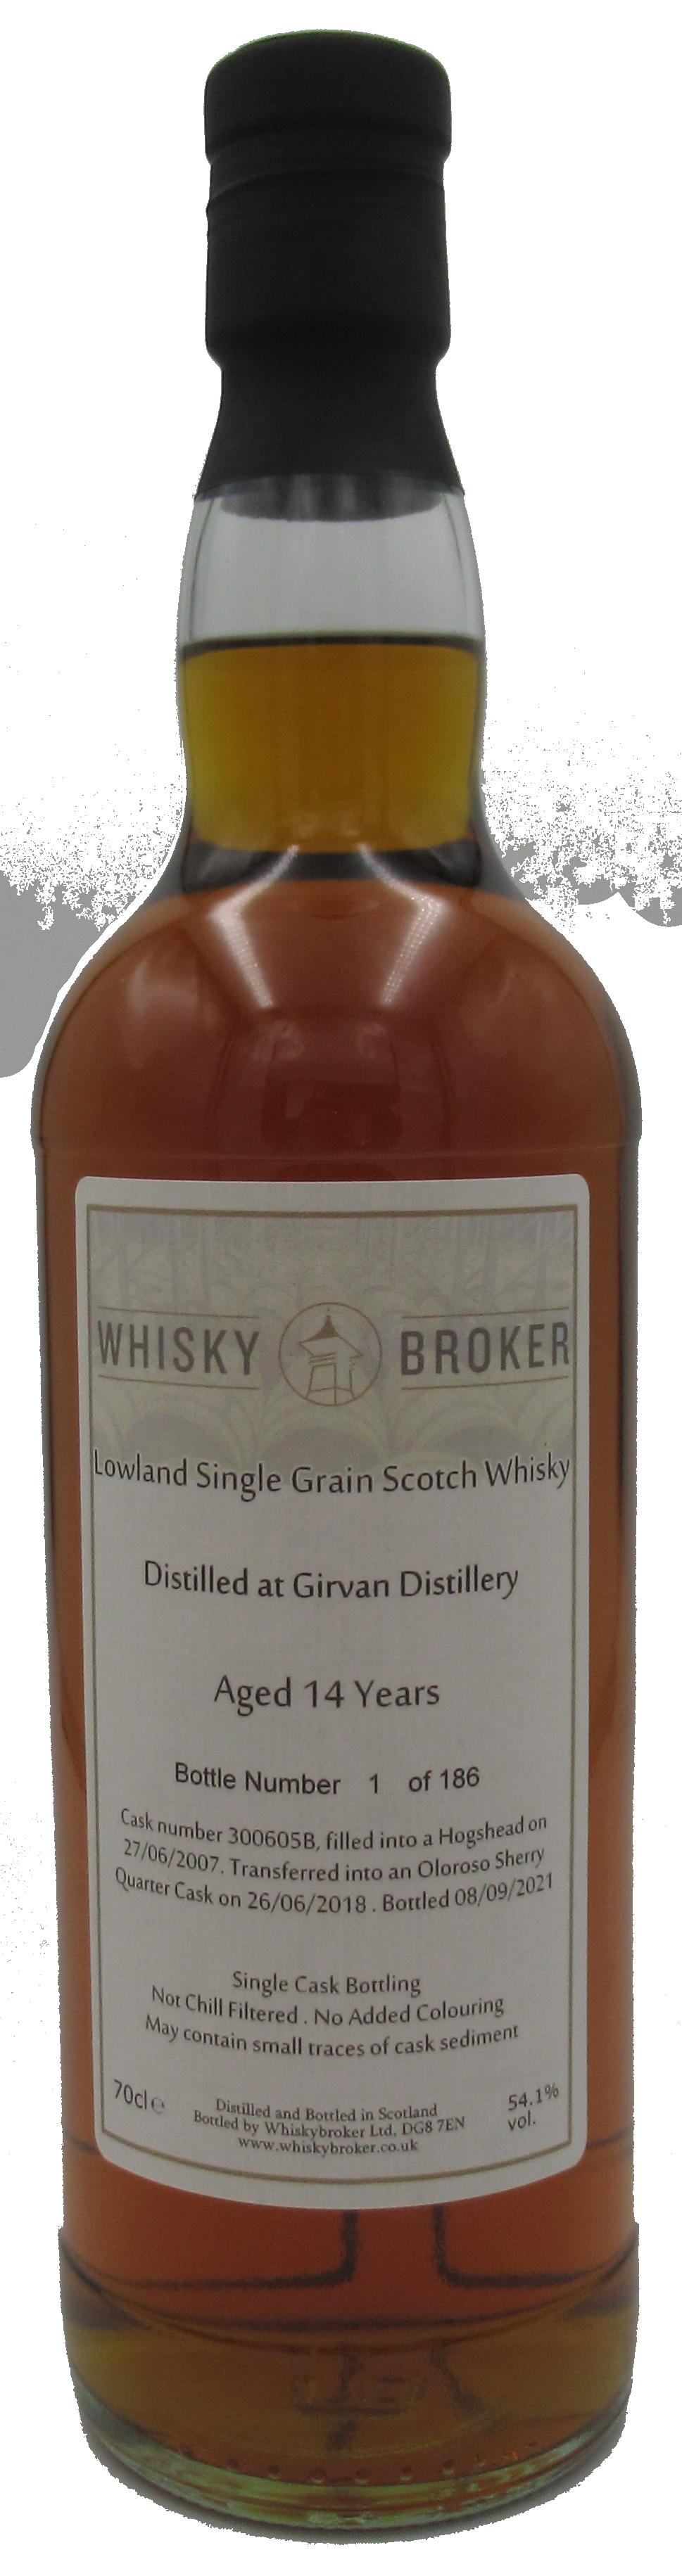 70cl, 14yo Distilled at Girvan Distillery 300605B